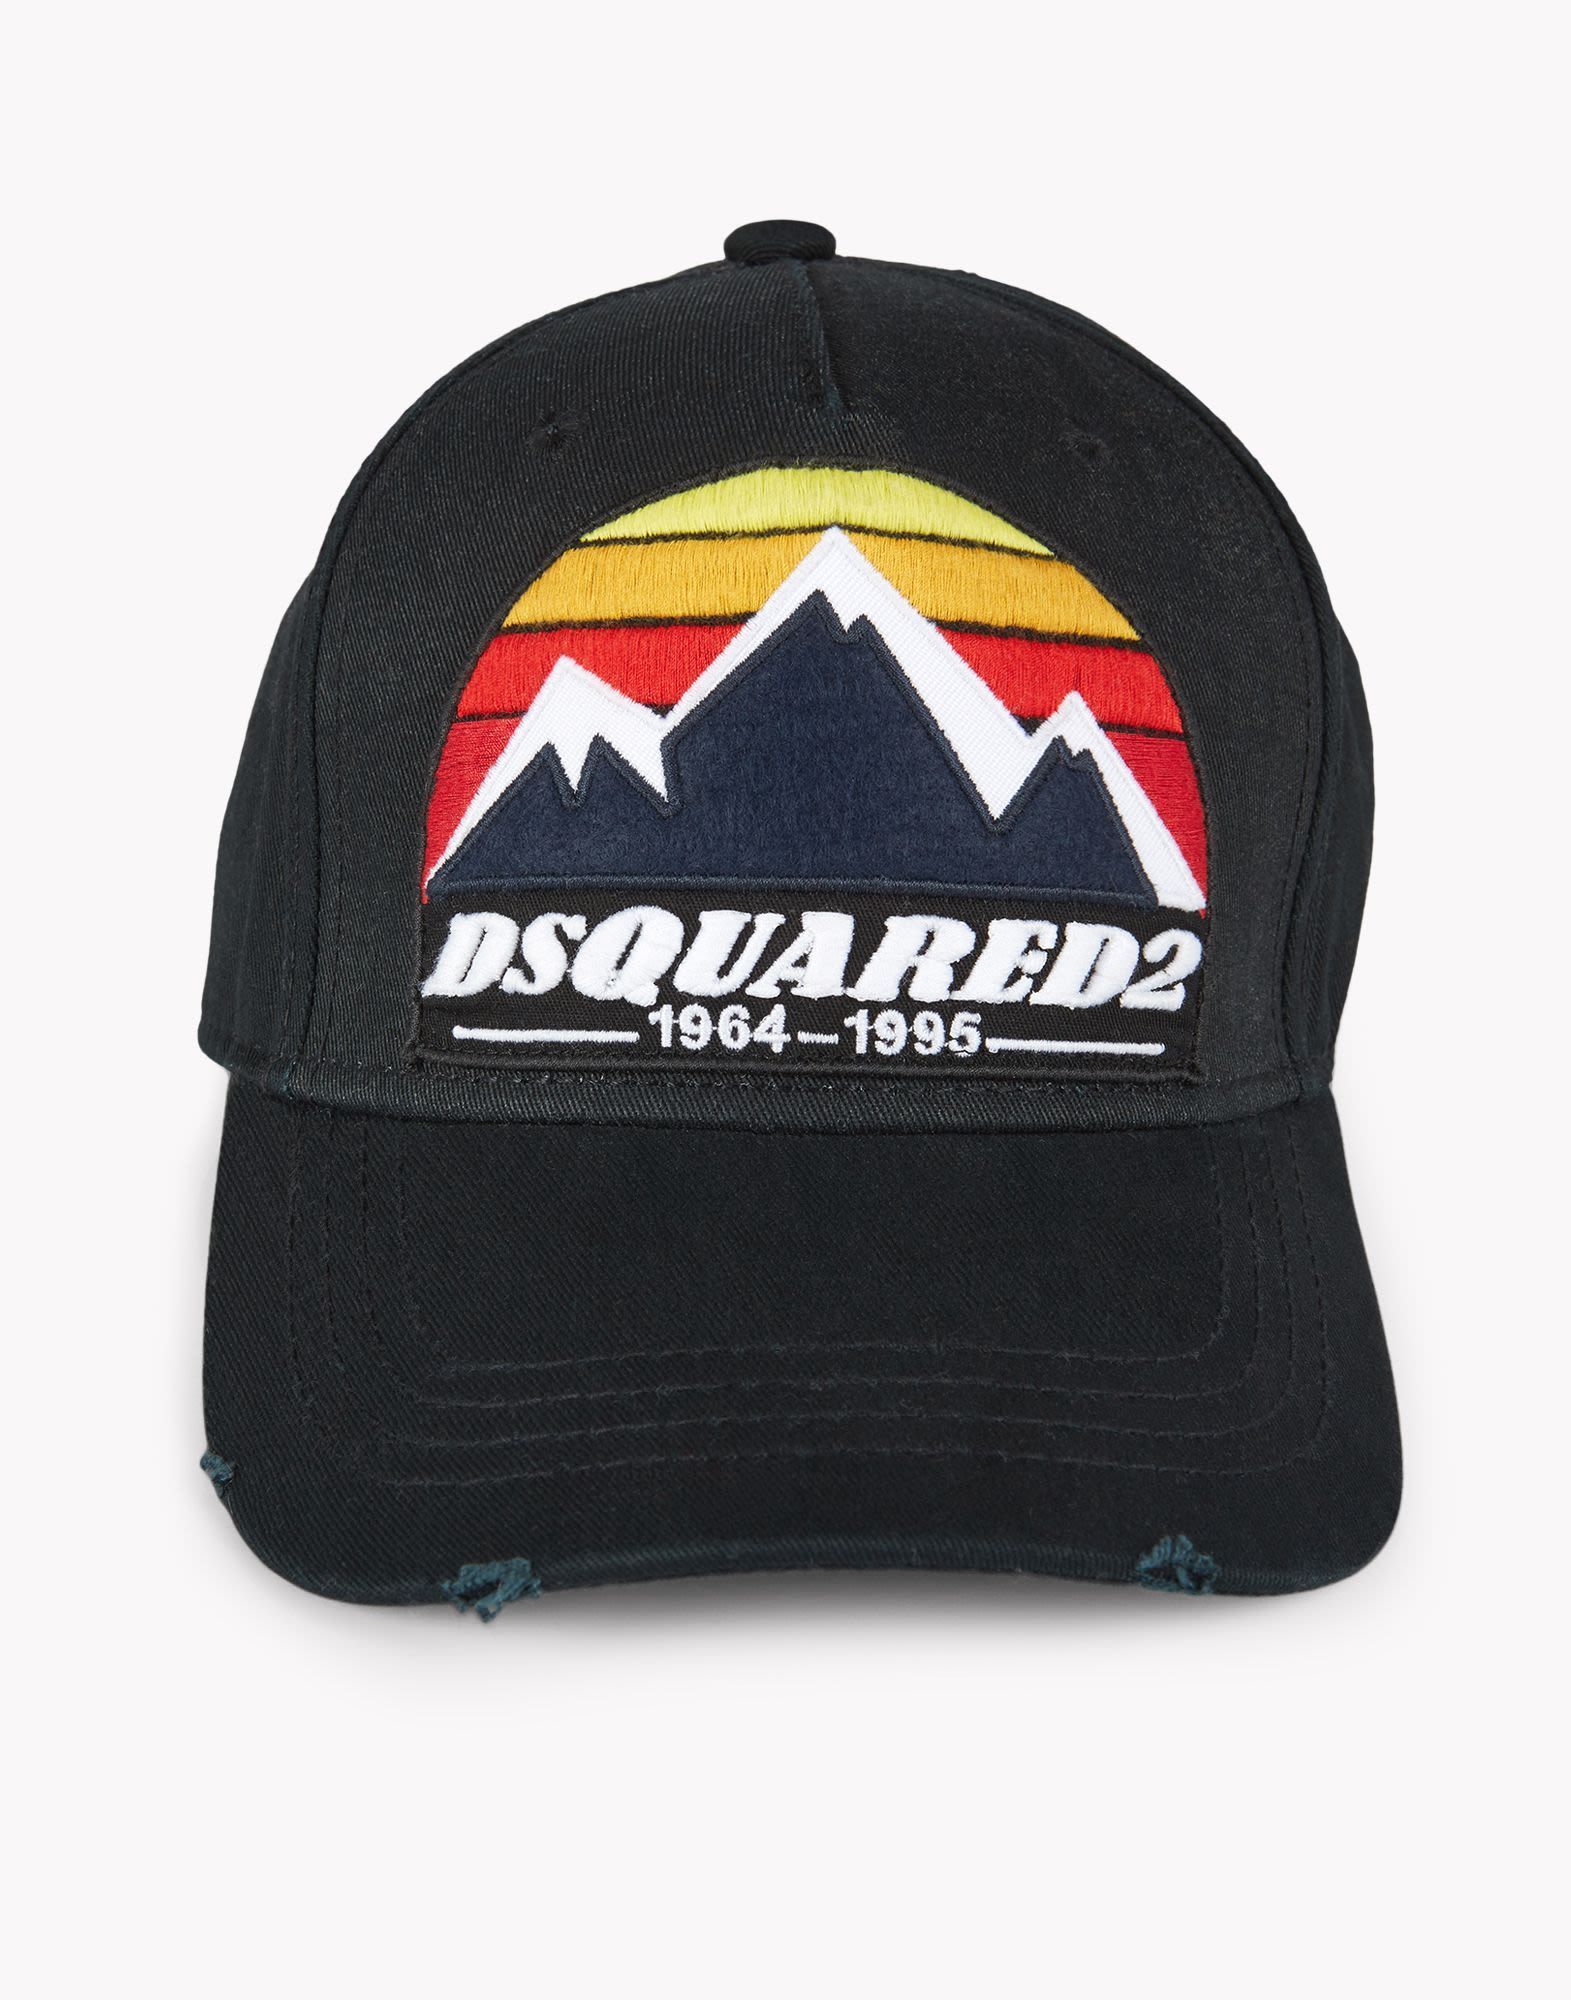 21f623534be DSQUARED2 D2 MOUNTAIN BASEBALL CAP.  dsquared2